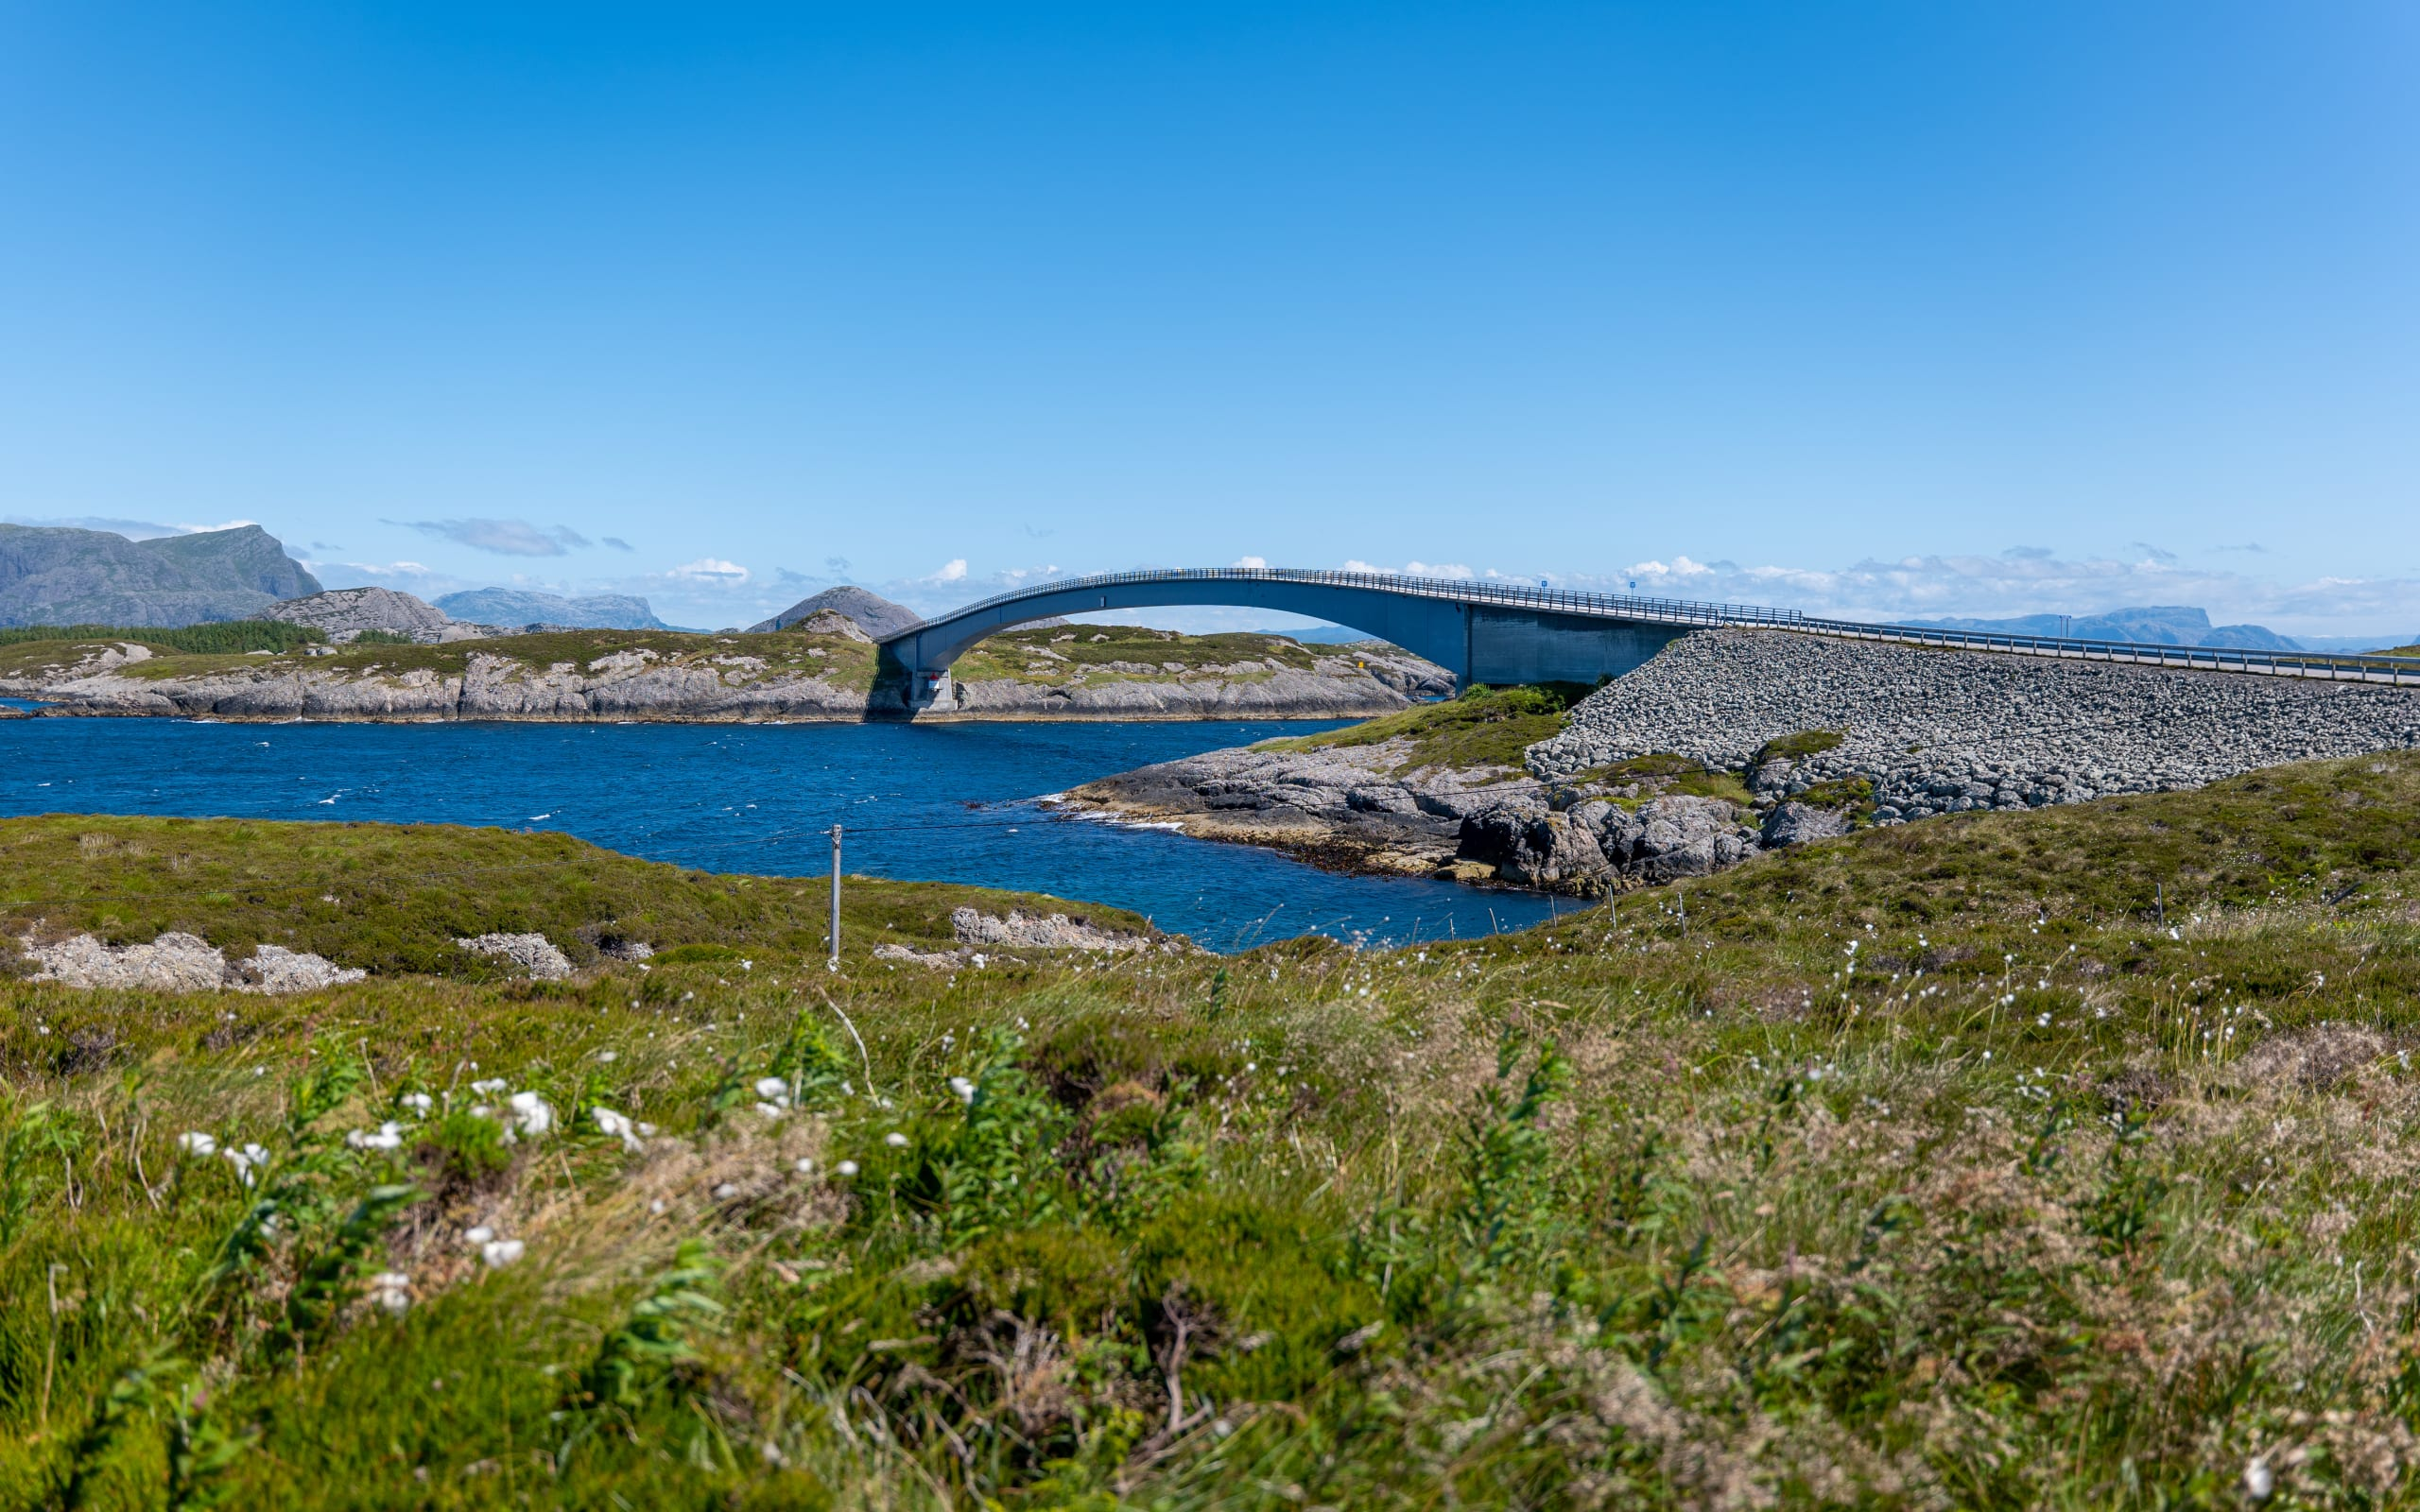 The North Sea gateway bridge